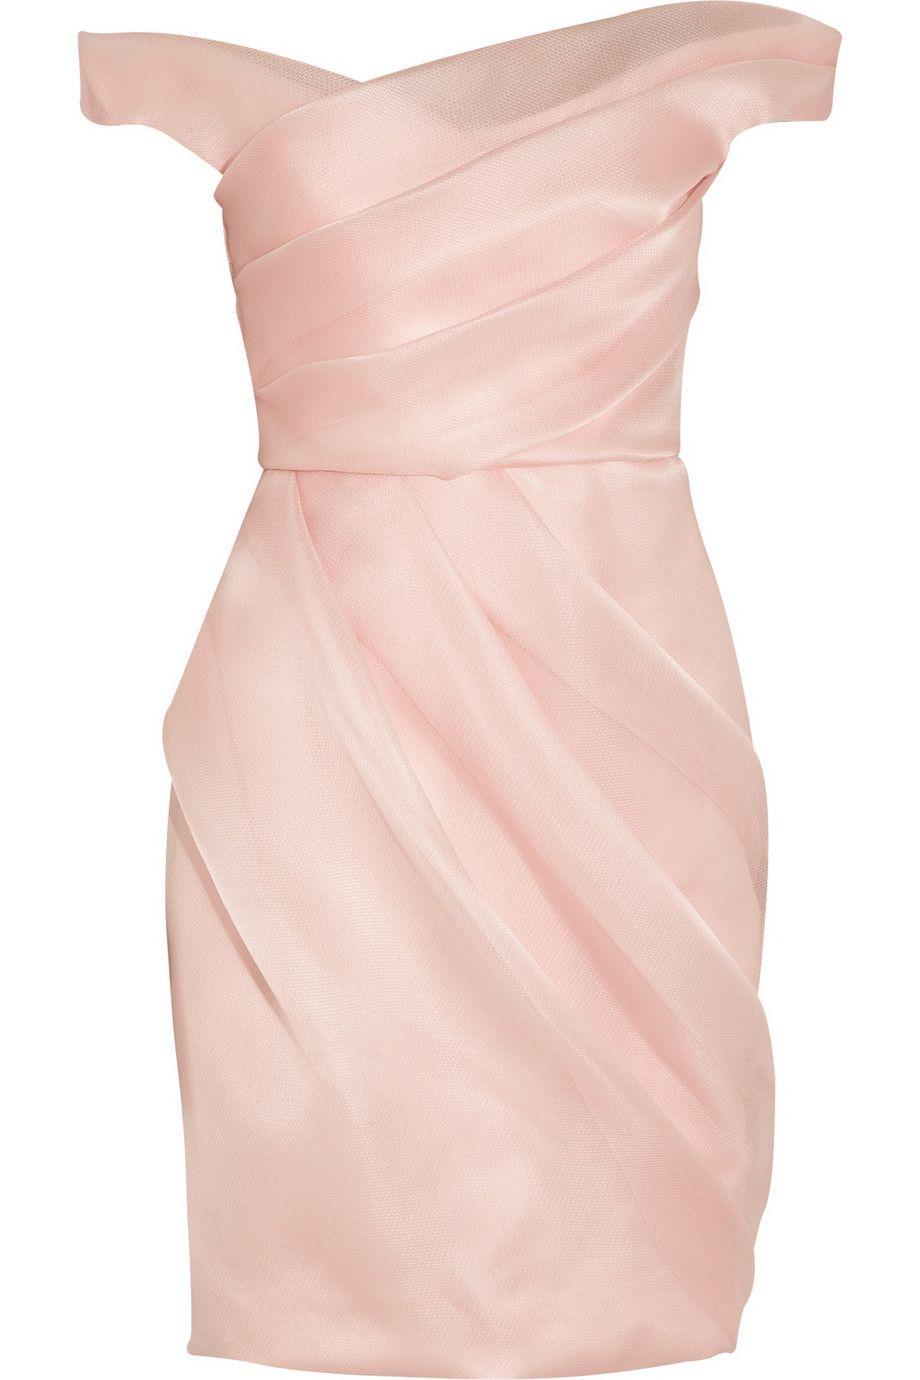 Lela Rose | Pleated silk-organza dress | in #pastel #pink color ...